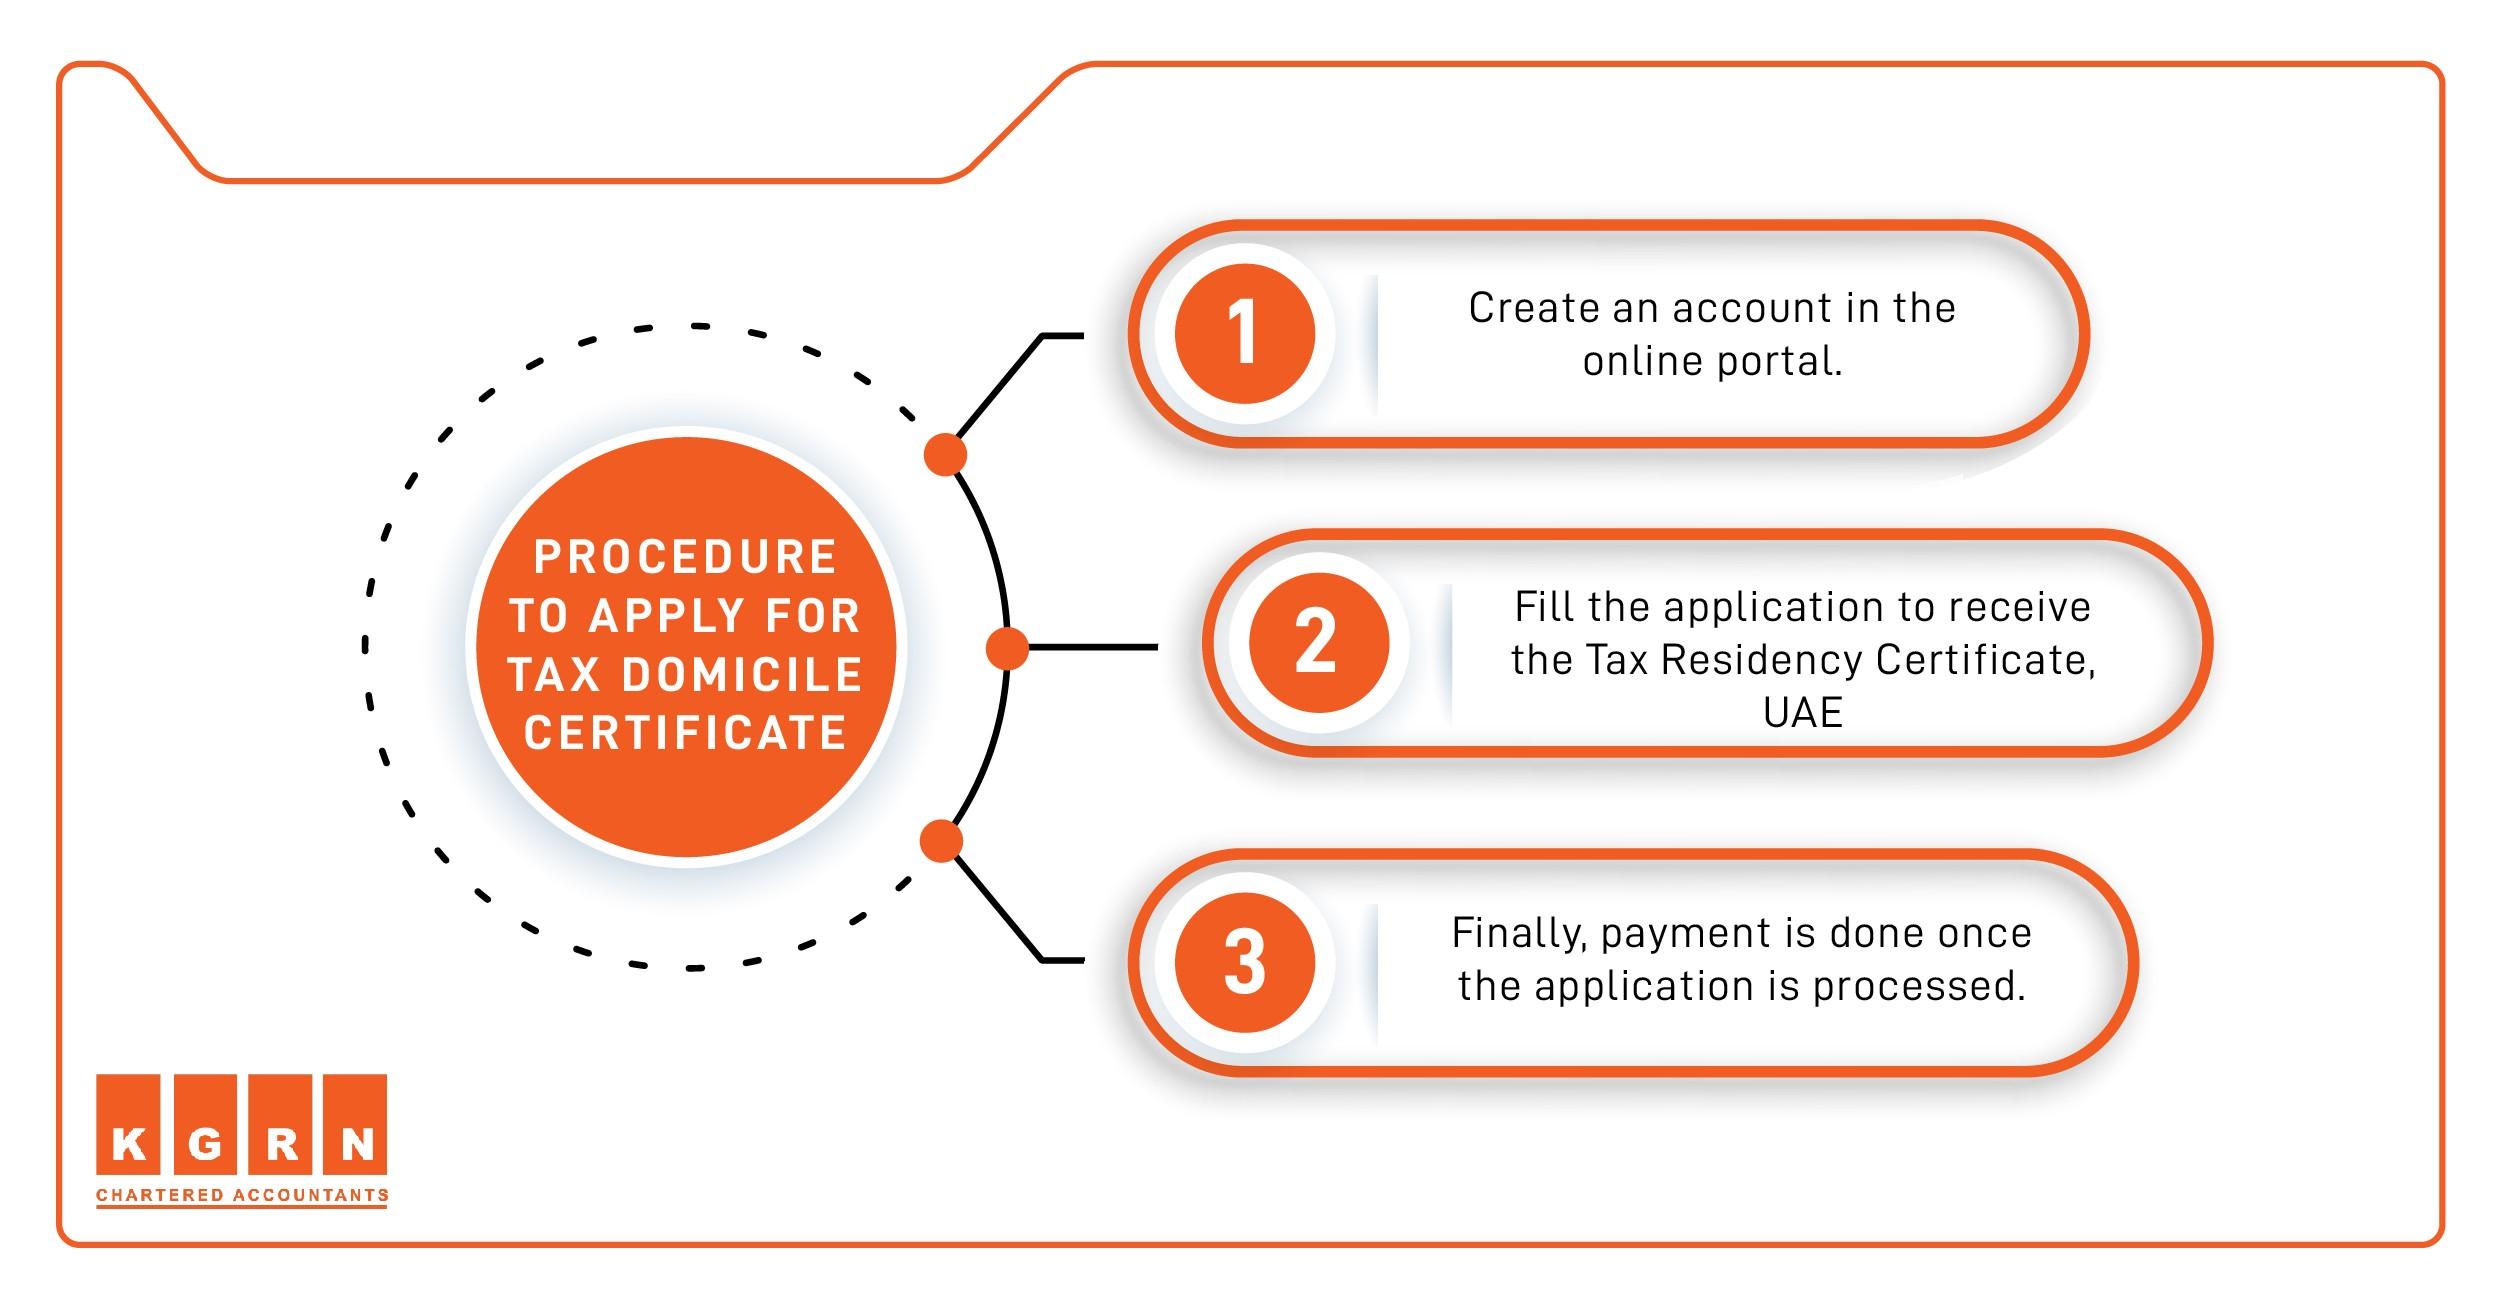 Tax Residency Certificate in UAE